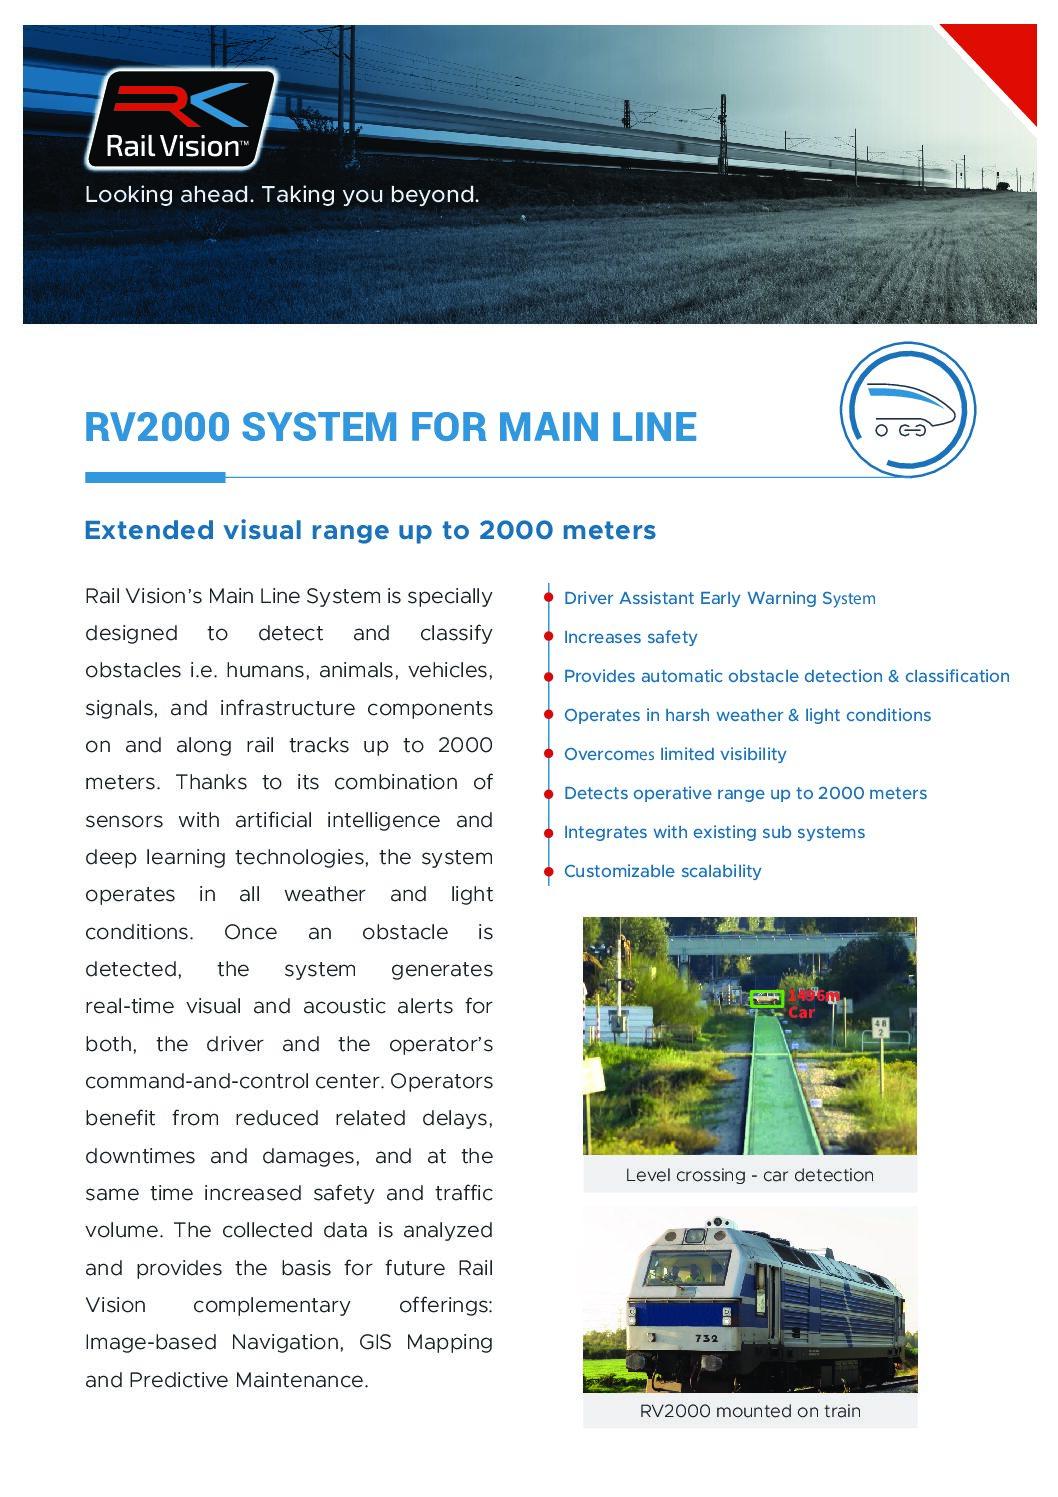 Rail Vision Main Line Fact Sheet